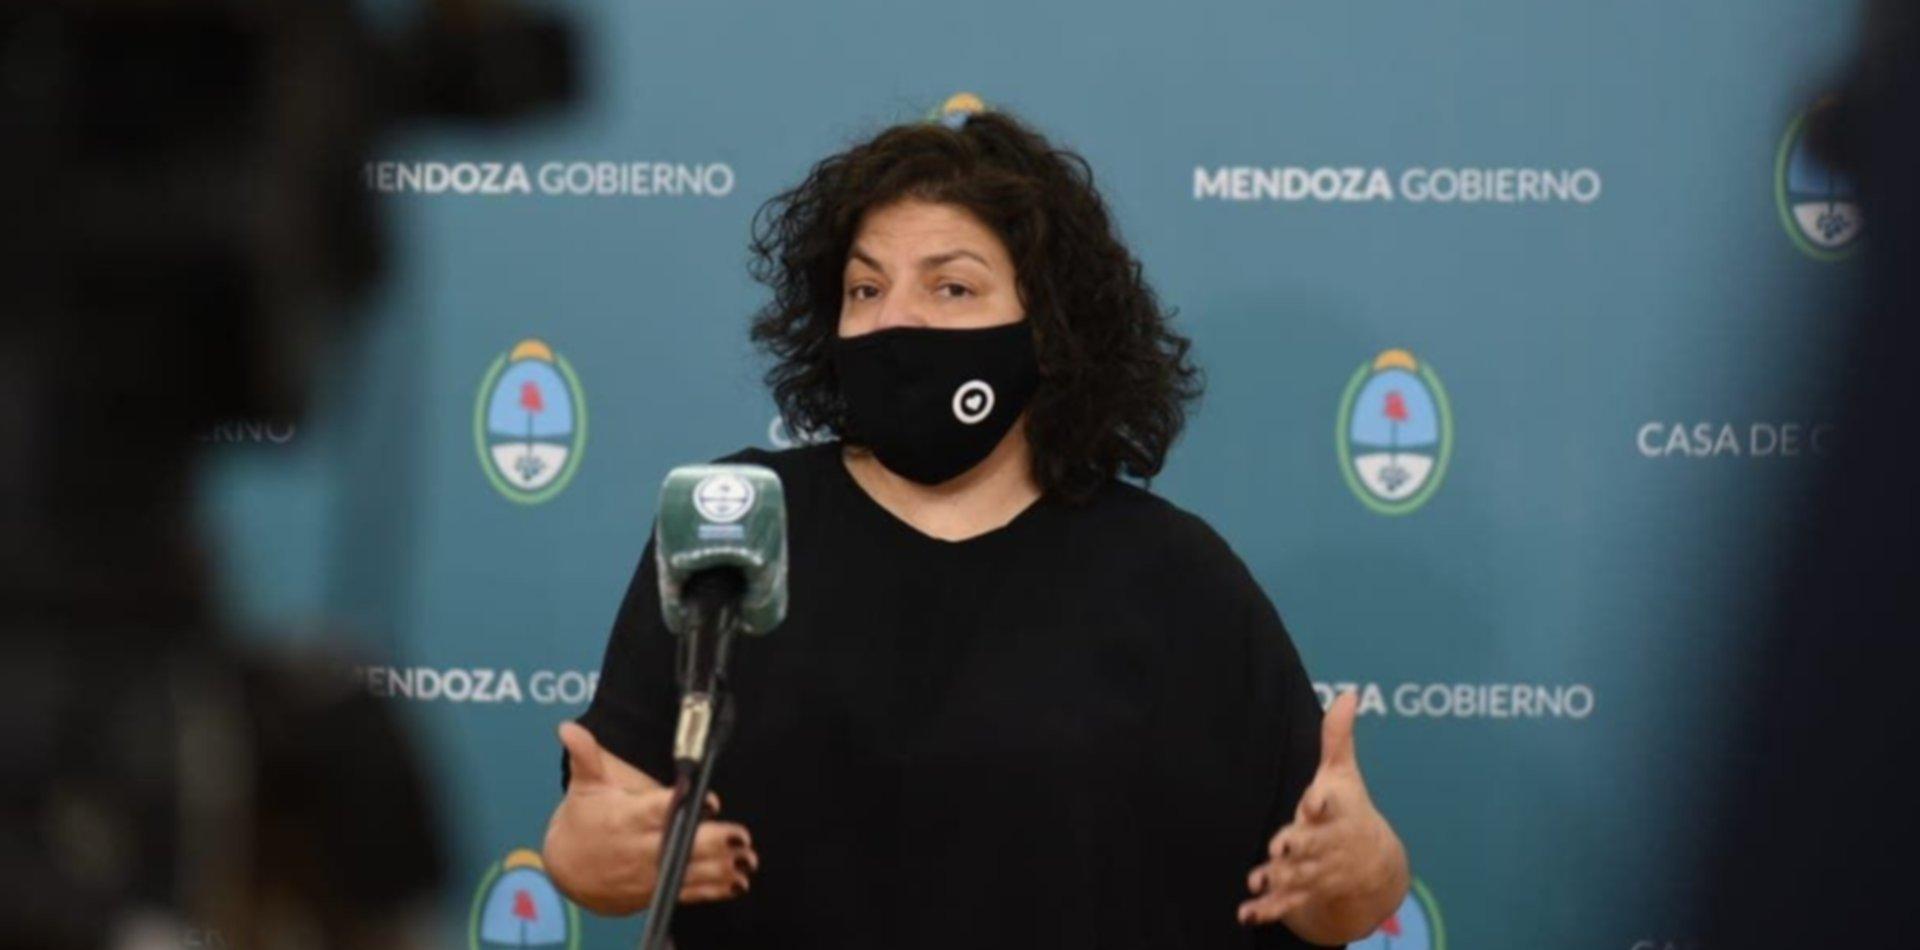 La ministra de Salud Carla Vizzotti tiene coronavirus